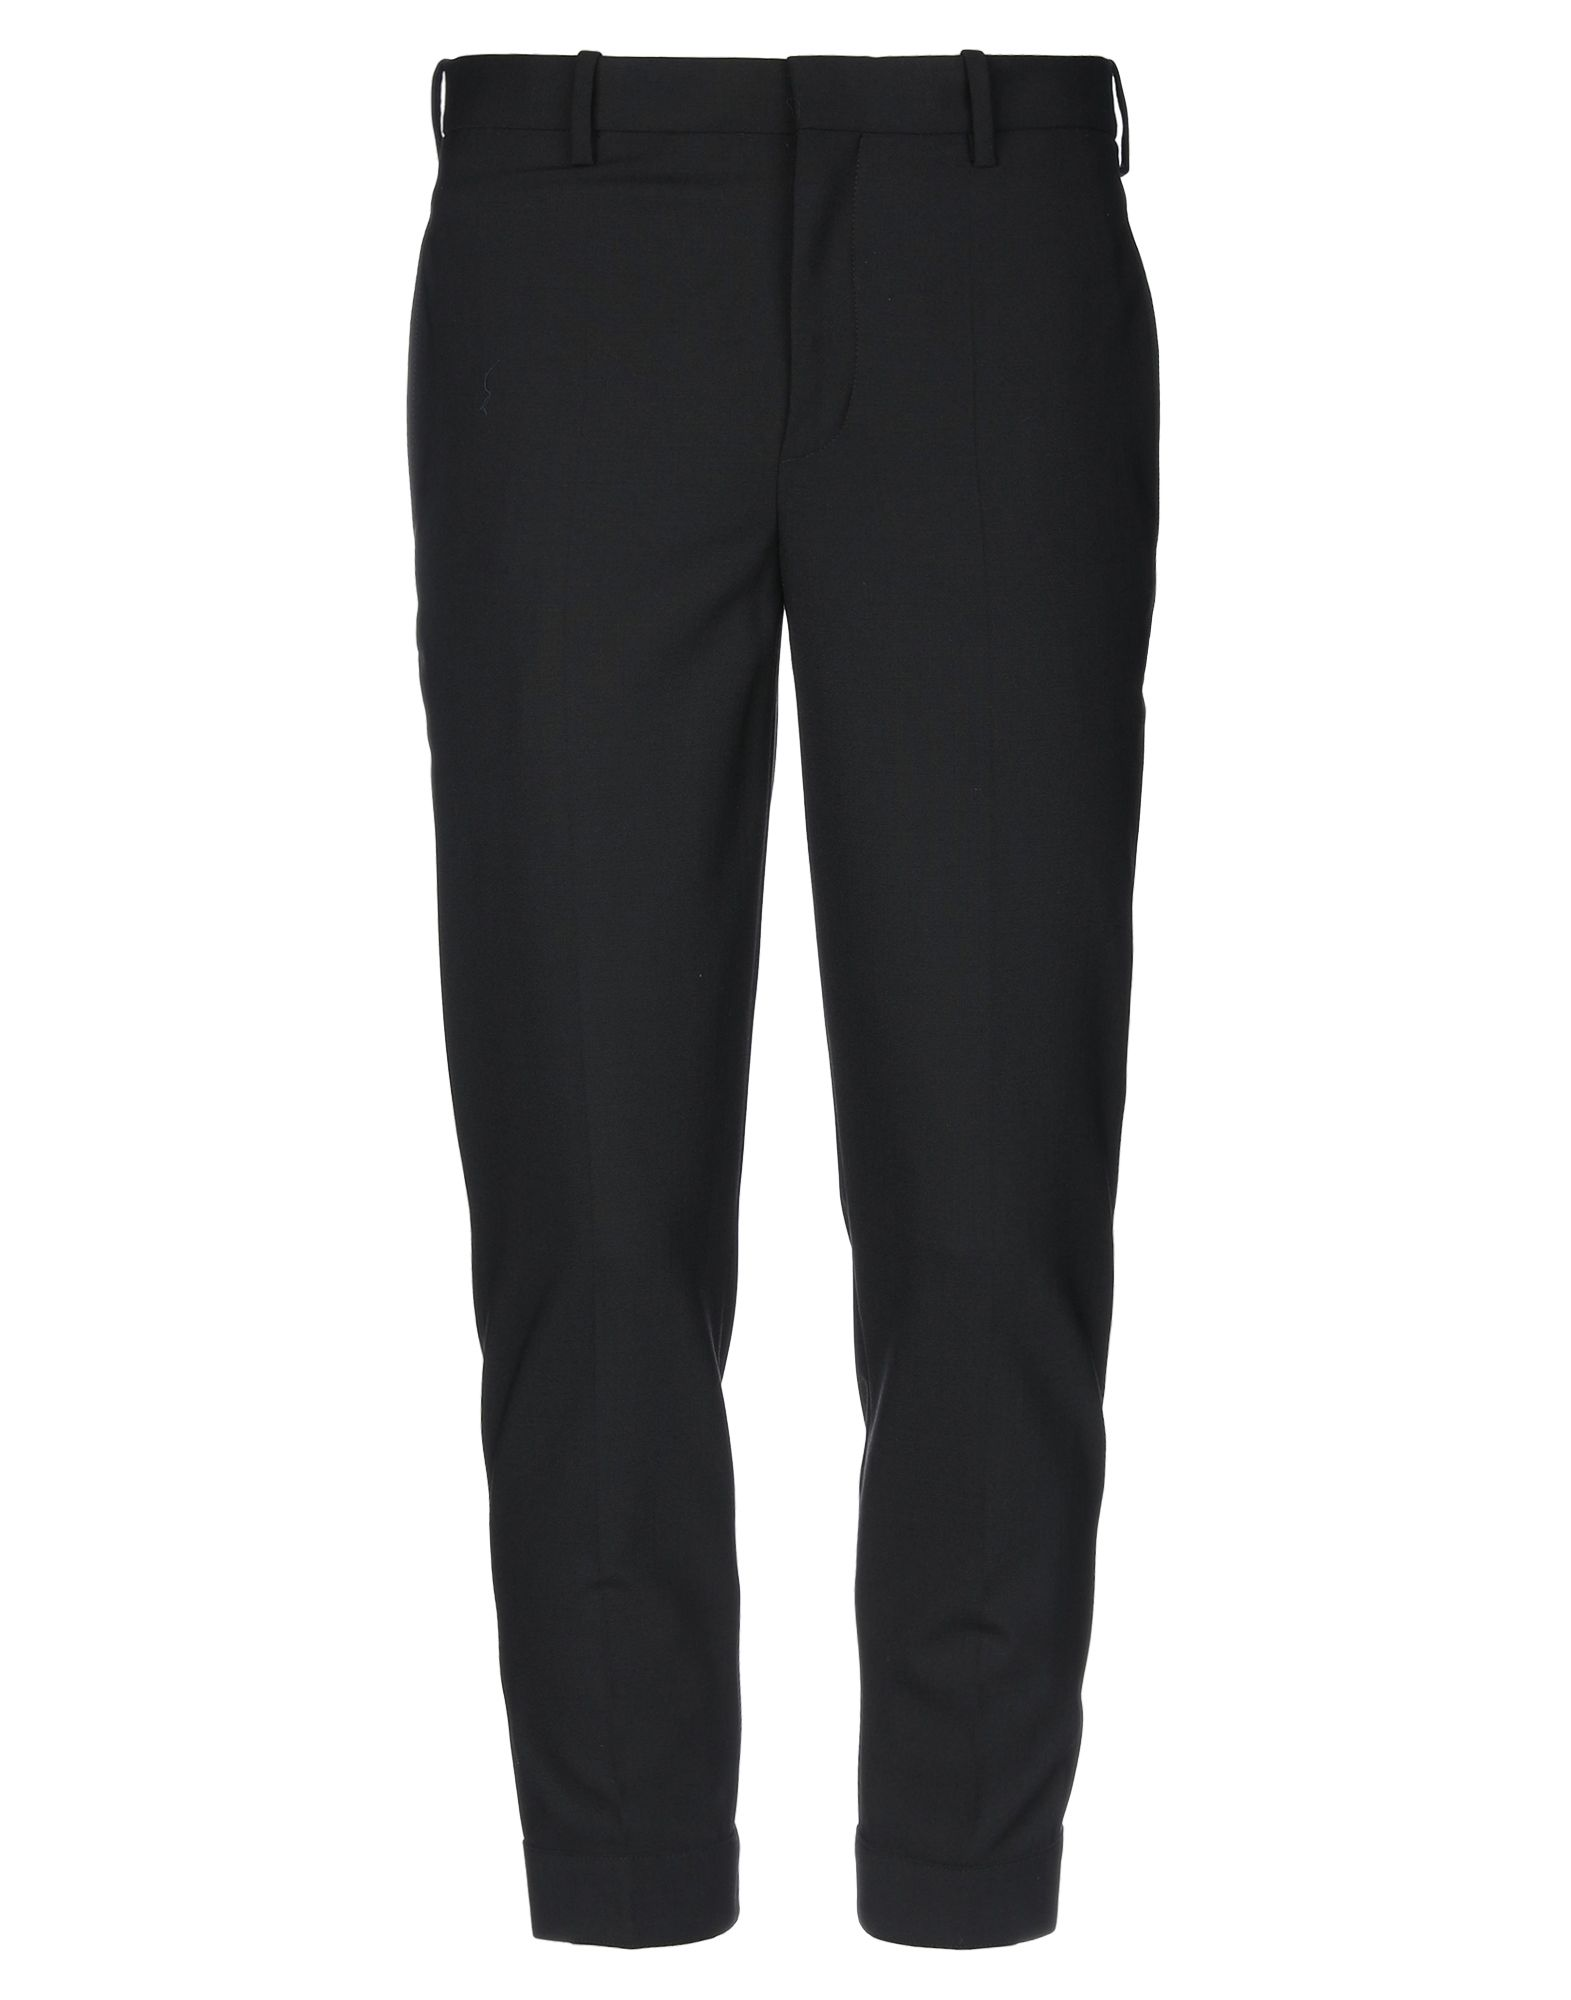 Pantalone Neil Barrett uomo - - 13363384GX